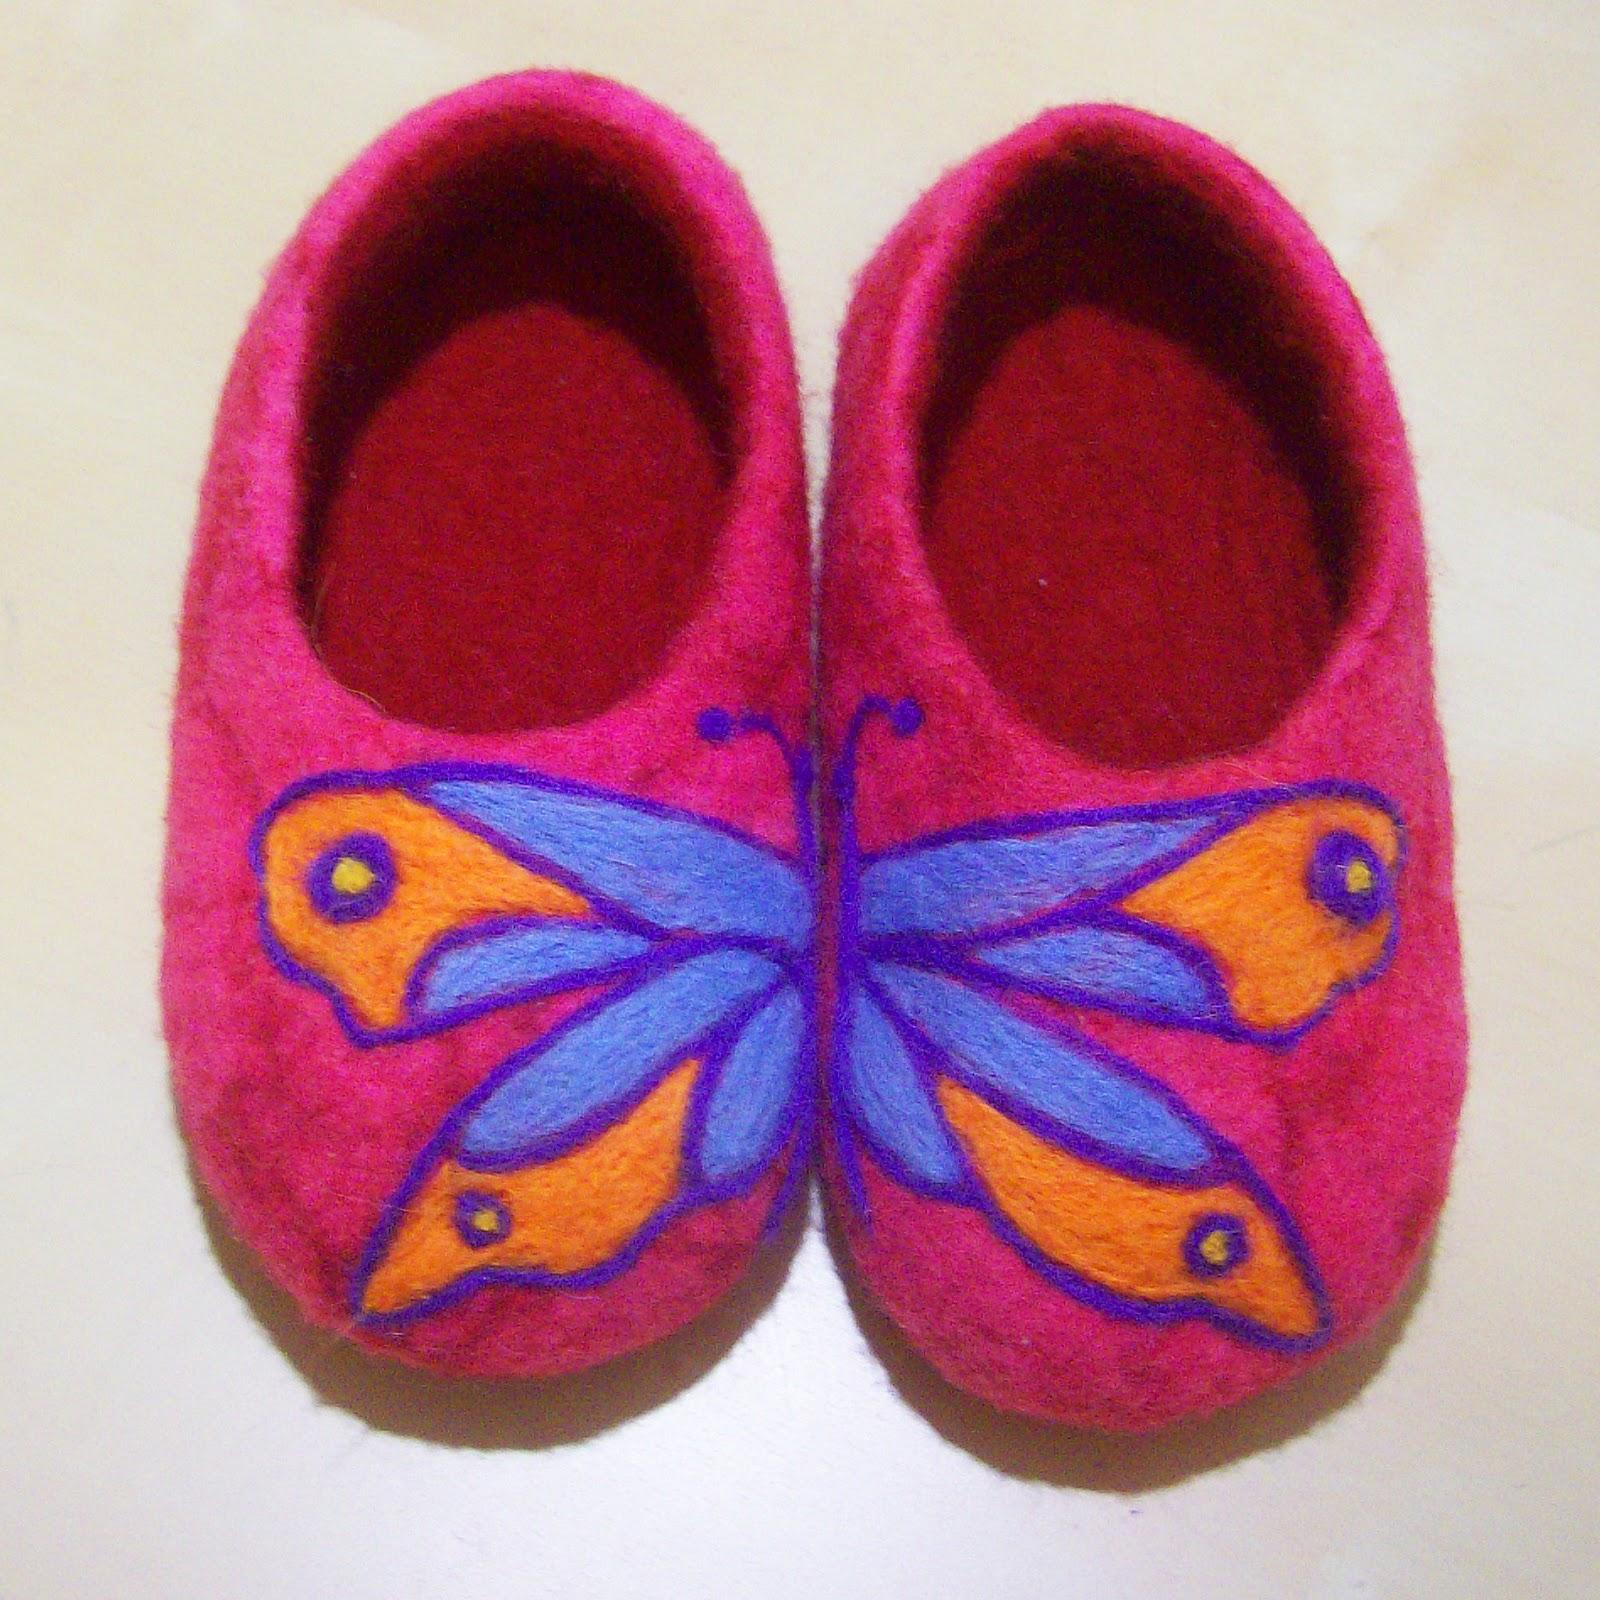 мокрое валяние по МК, тапочки - бабочки